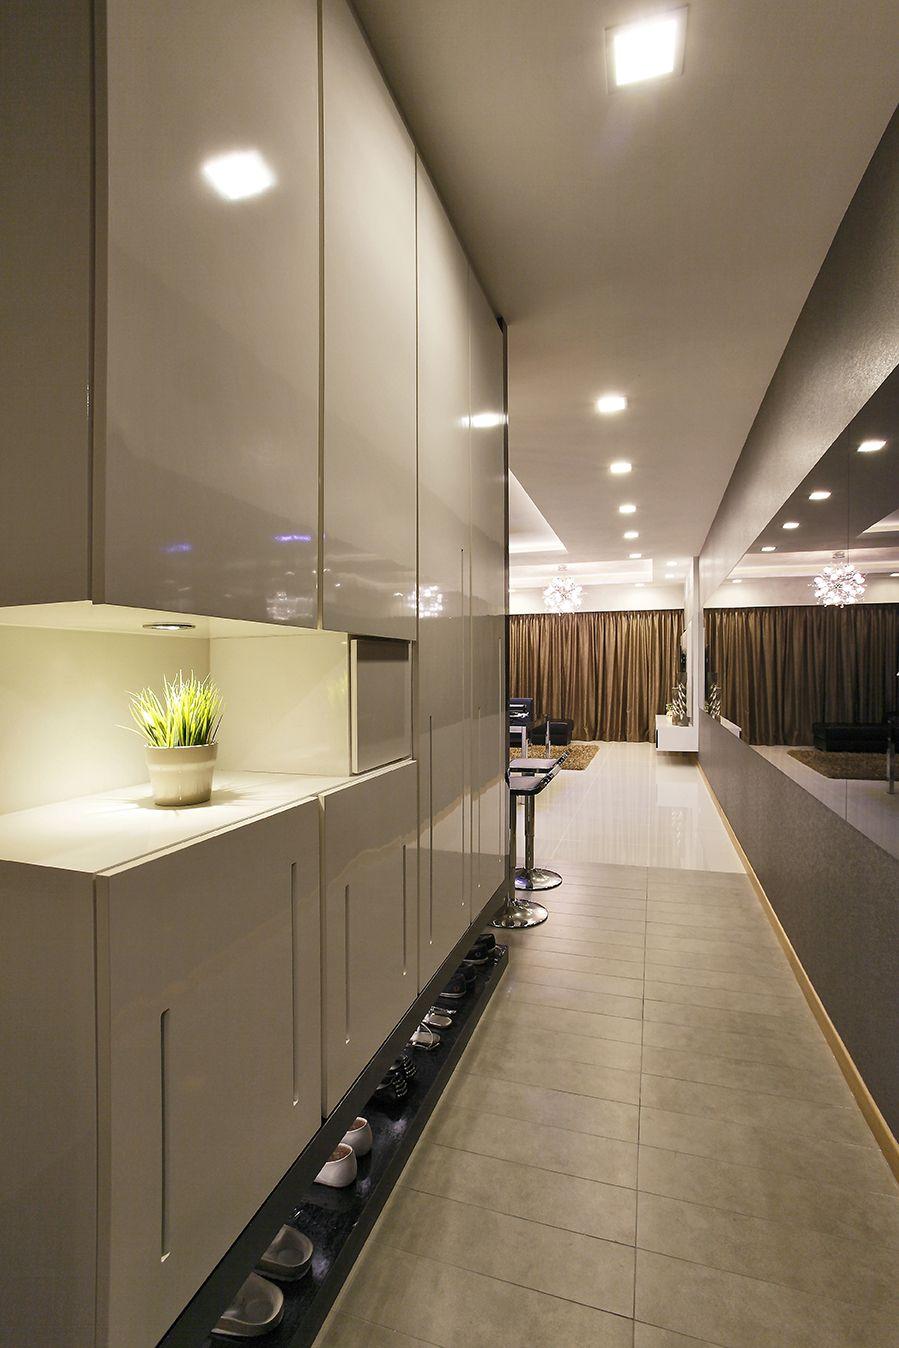 4 room bto master bedroom design  Kitchen Design by Interior Lab  Top Voted Home Interior Design